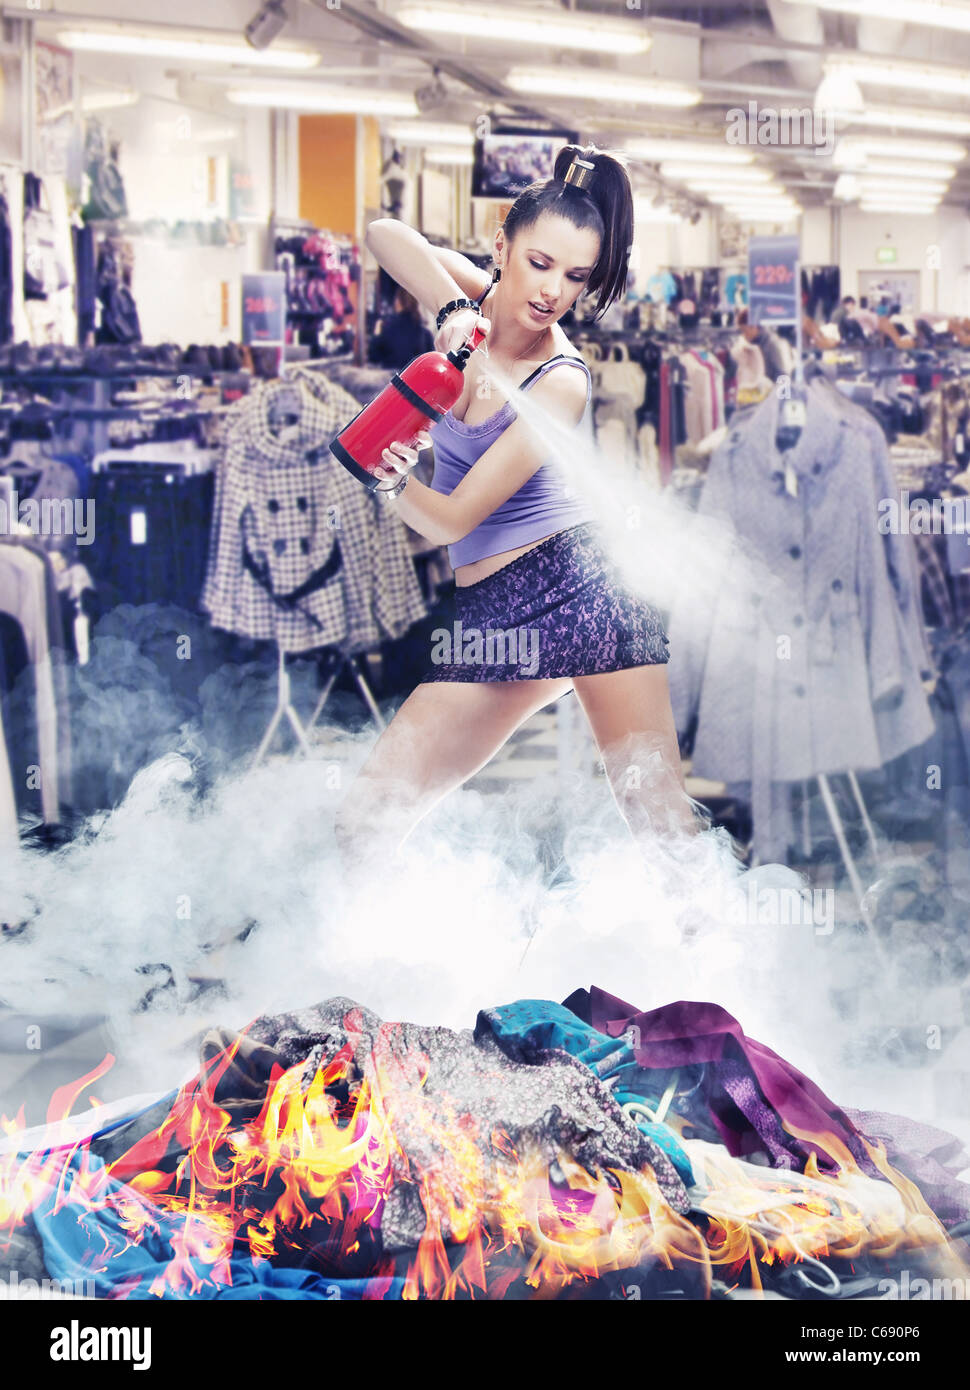 Nettes Mädchen Irl ist der Brandlöschung Kleidung Stockbild